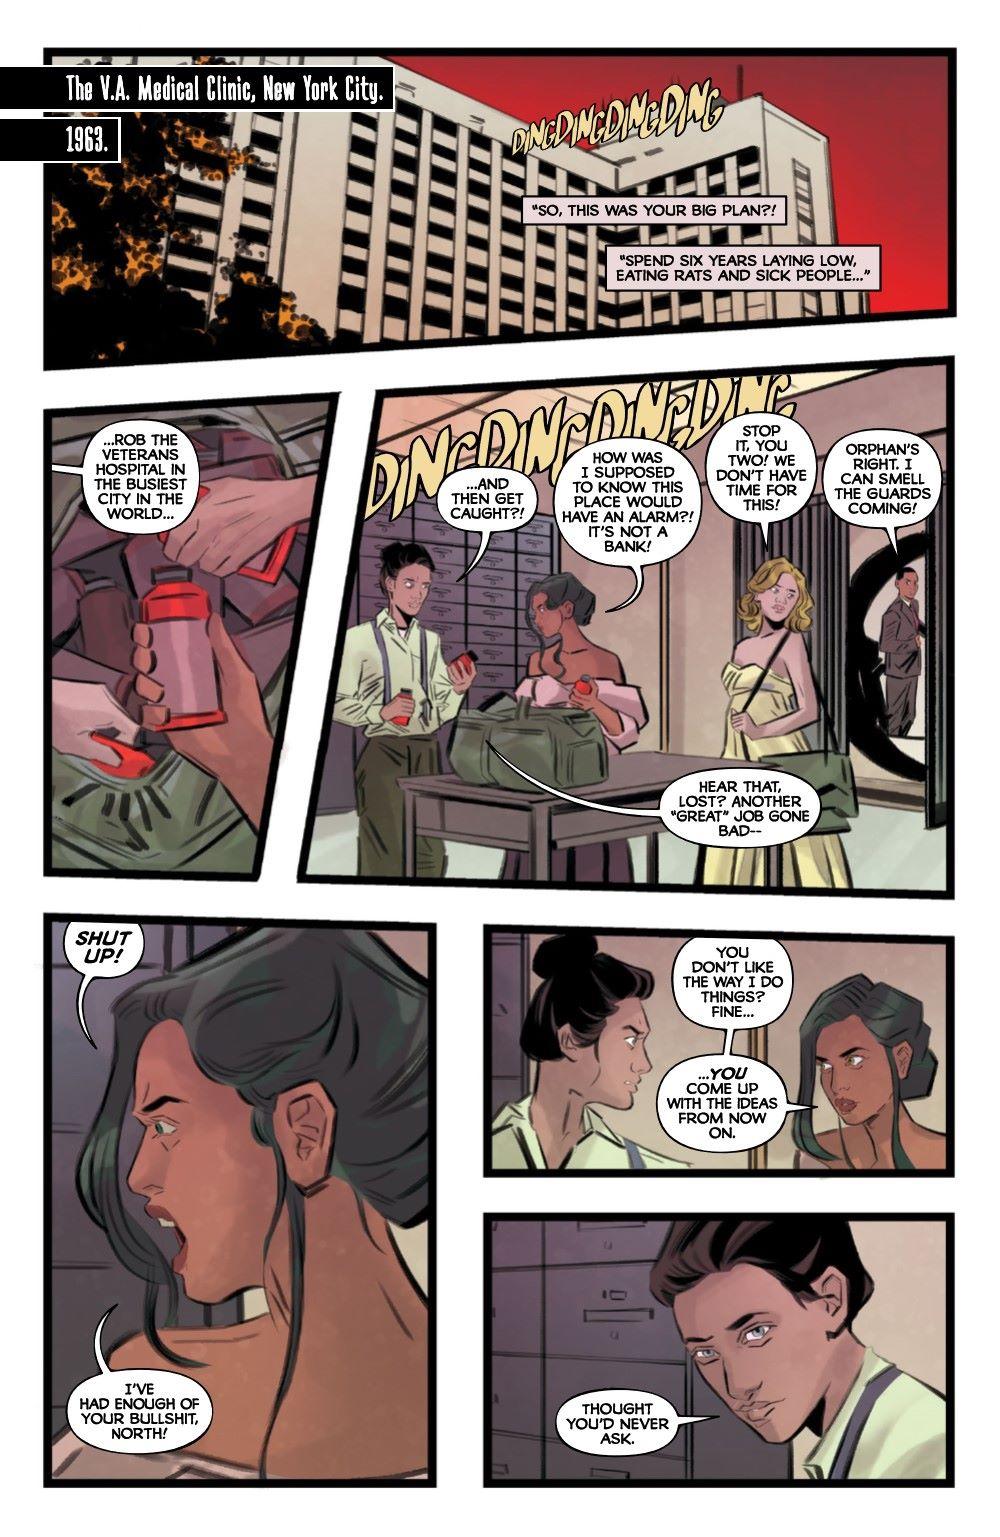 VAIN-4-MARKETING-03 ComicList Previews: THE VAIN #4